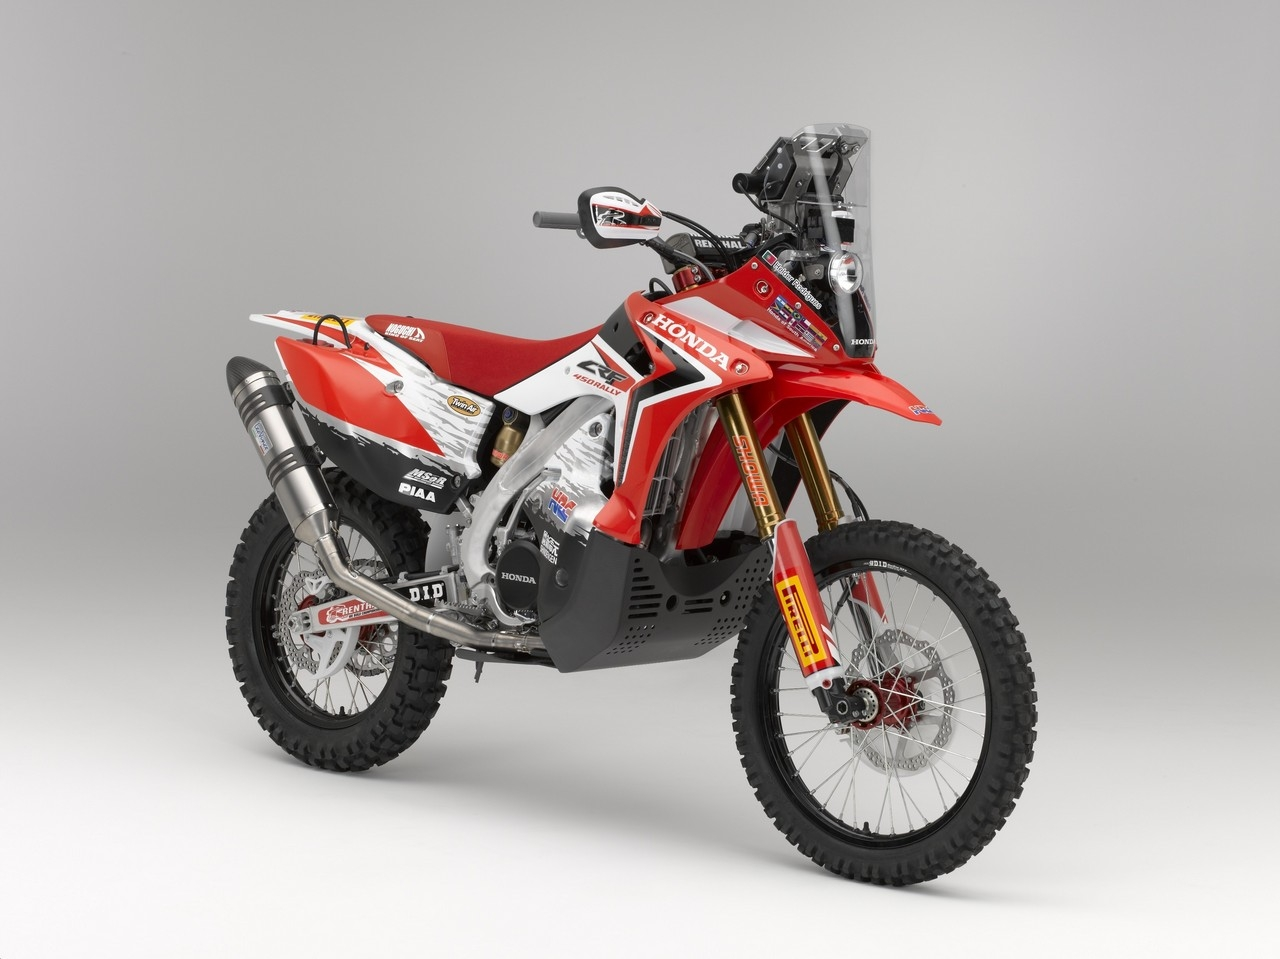 Honda Launches Dakar Assault With The New Crf 450 Rally Autoevolution